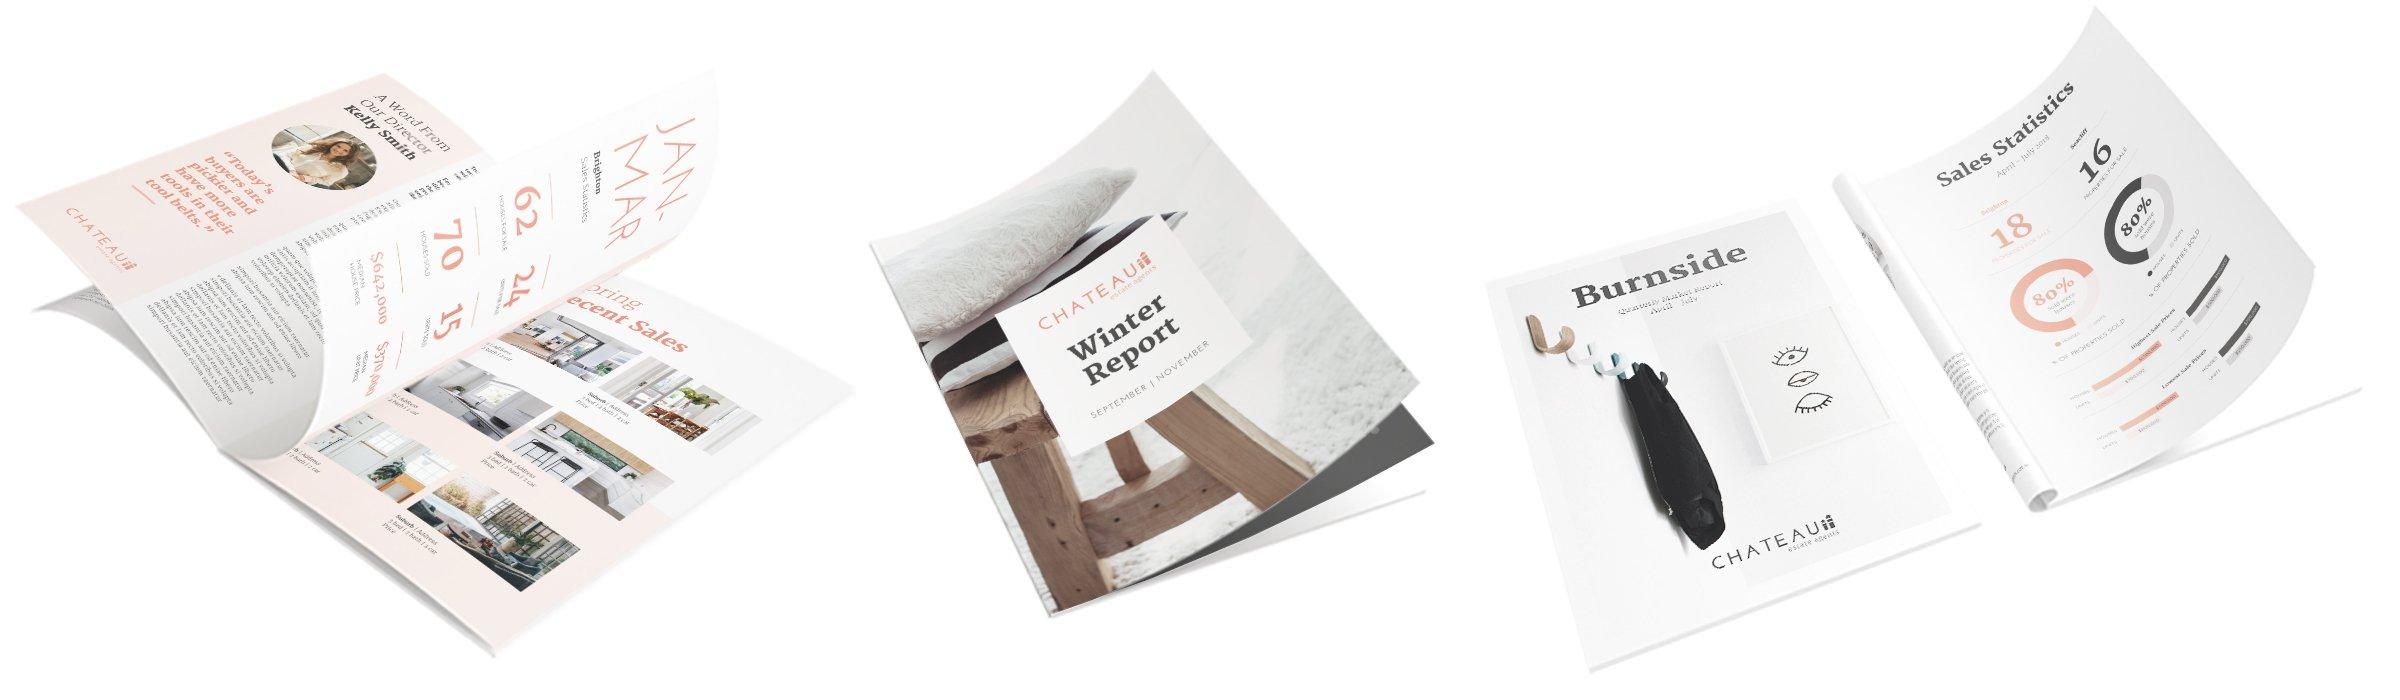 Postcode book - real estate print marketing